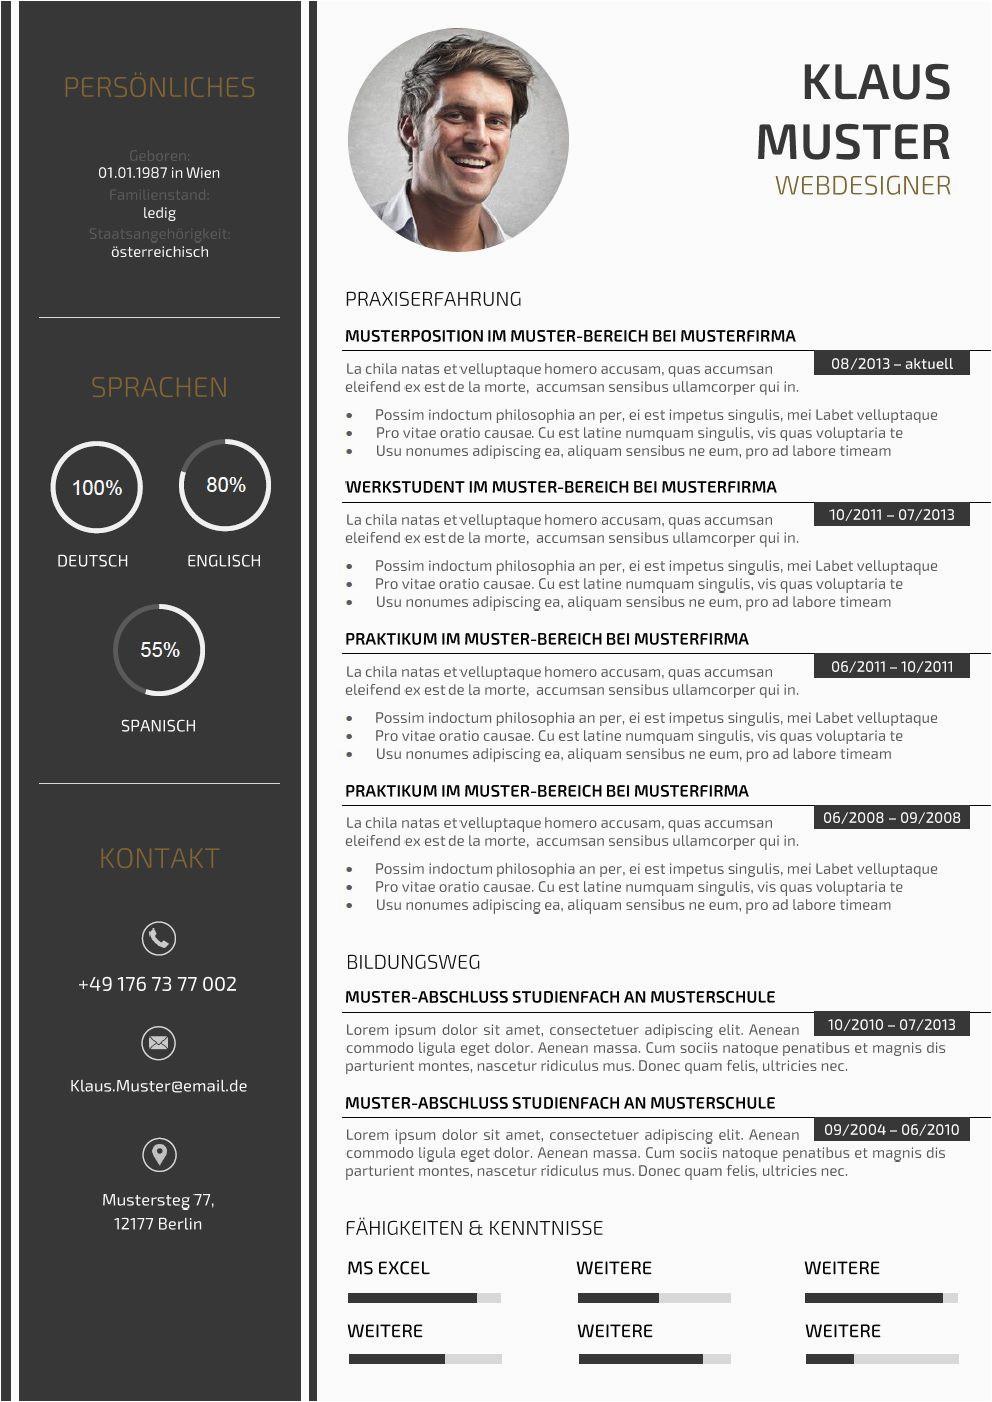 Lebenslauf Design Template Premium Bewerbungsmuster 3